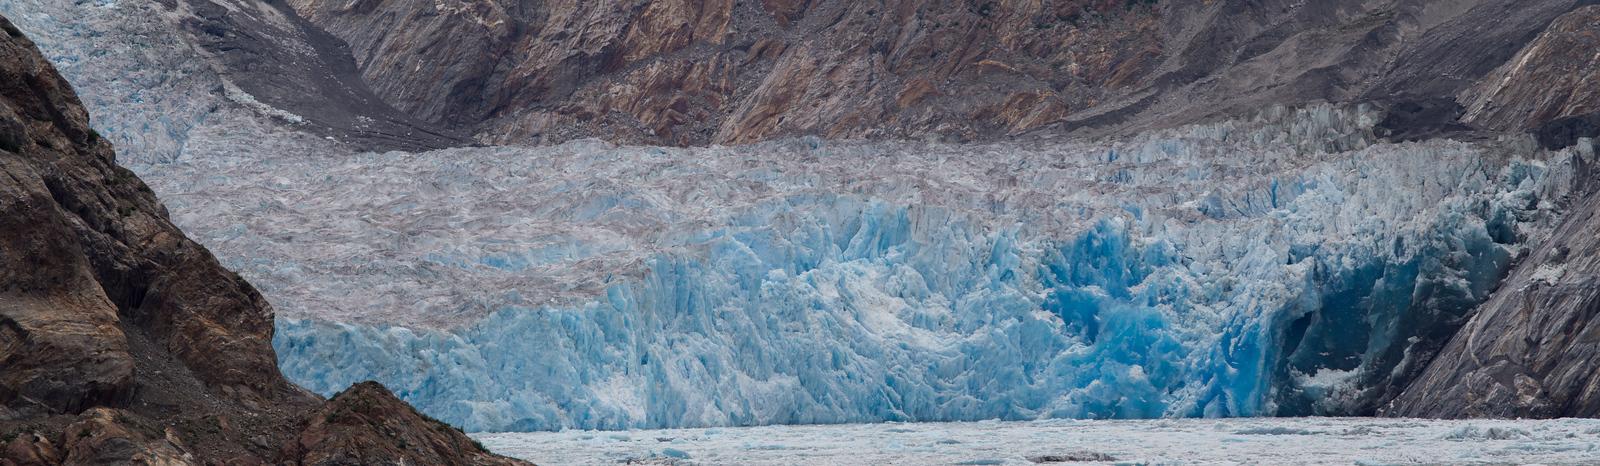 Sawyer Glacier Panorama